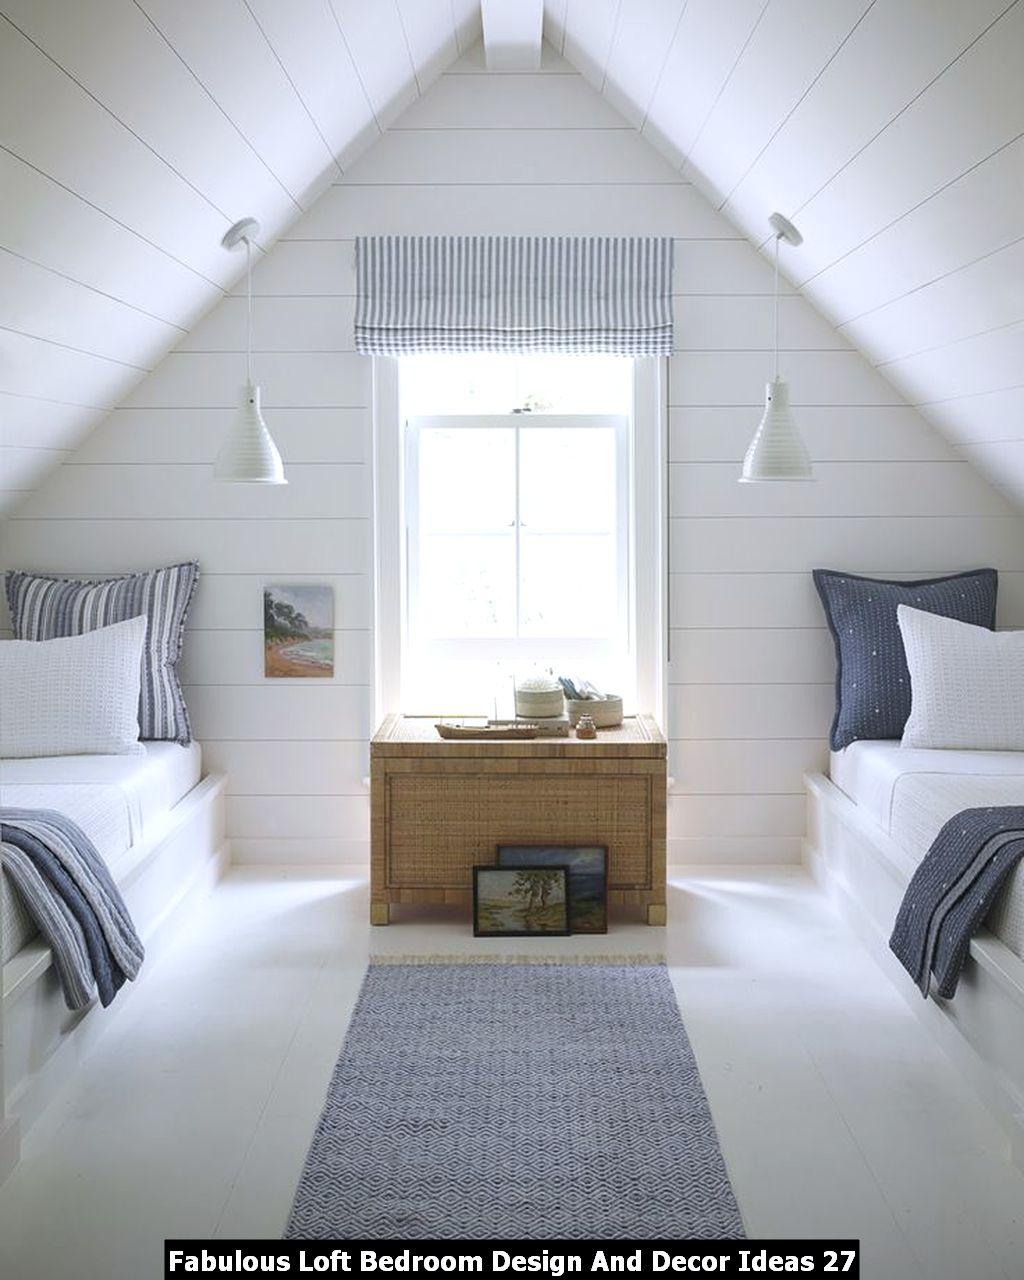 Fabulous Loft Bedroom Design And Decor Ideas 27